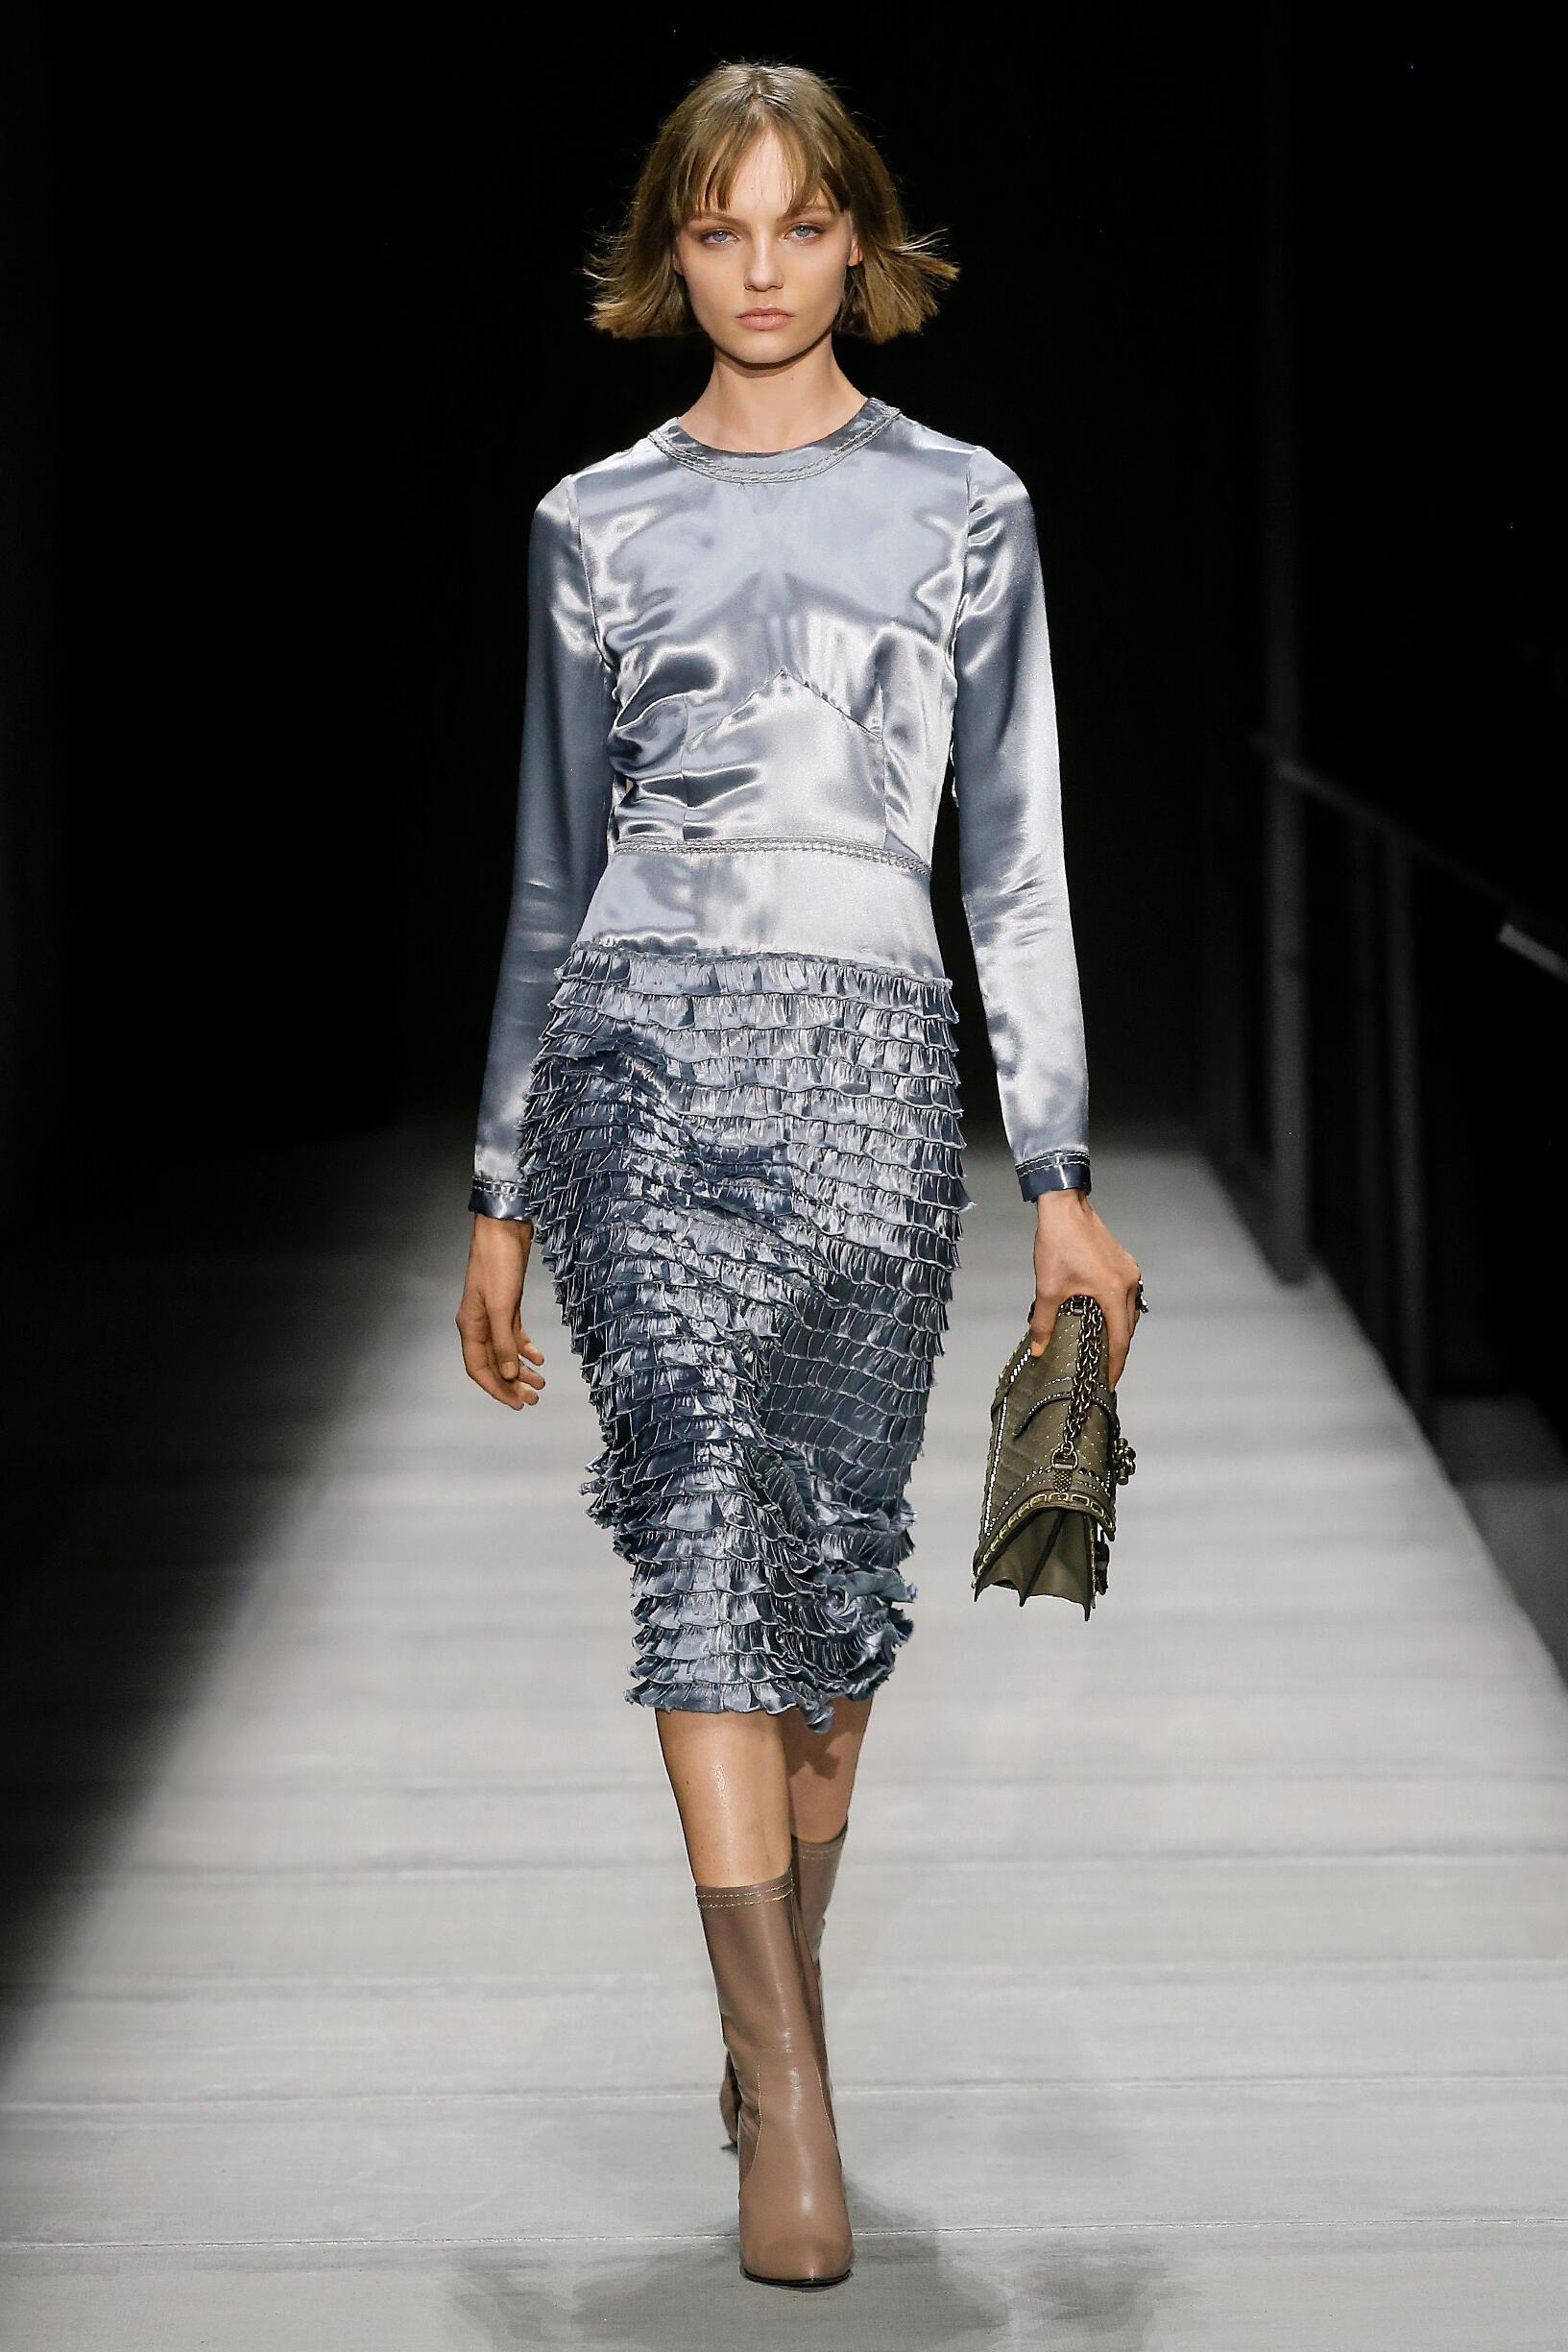 Fashion Woman Model Bottega Veneta Catwalk